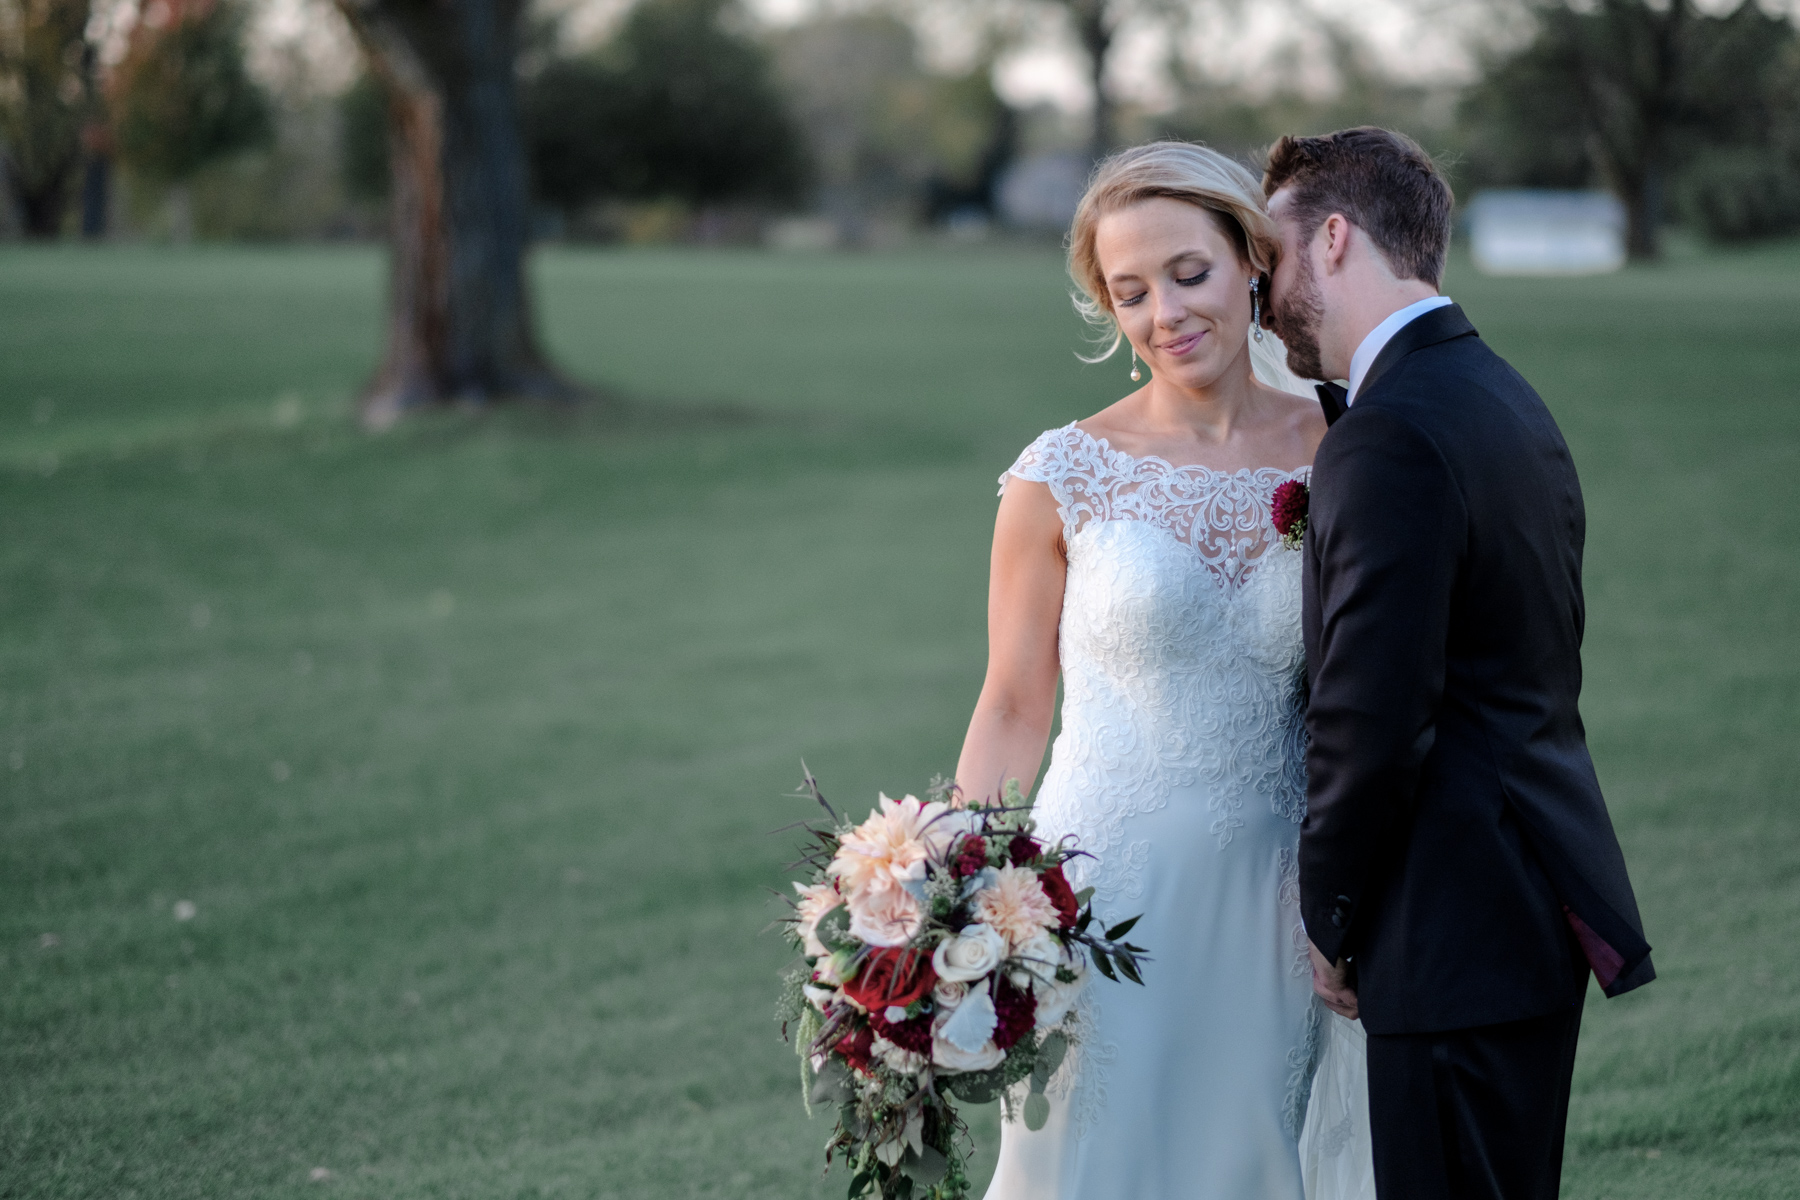 2017_BAP_KalliMatt_Gleneagles_CountryClub_Lemont_Wedding-61.jpg